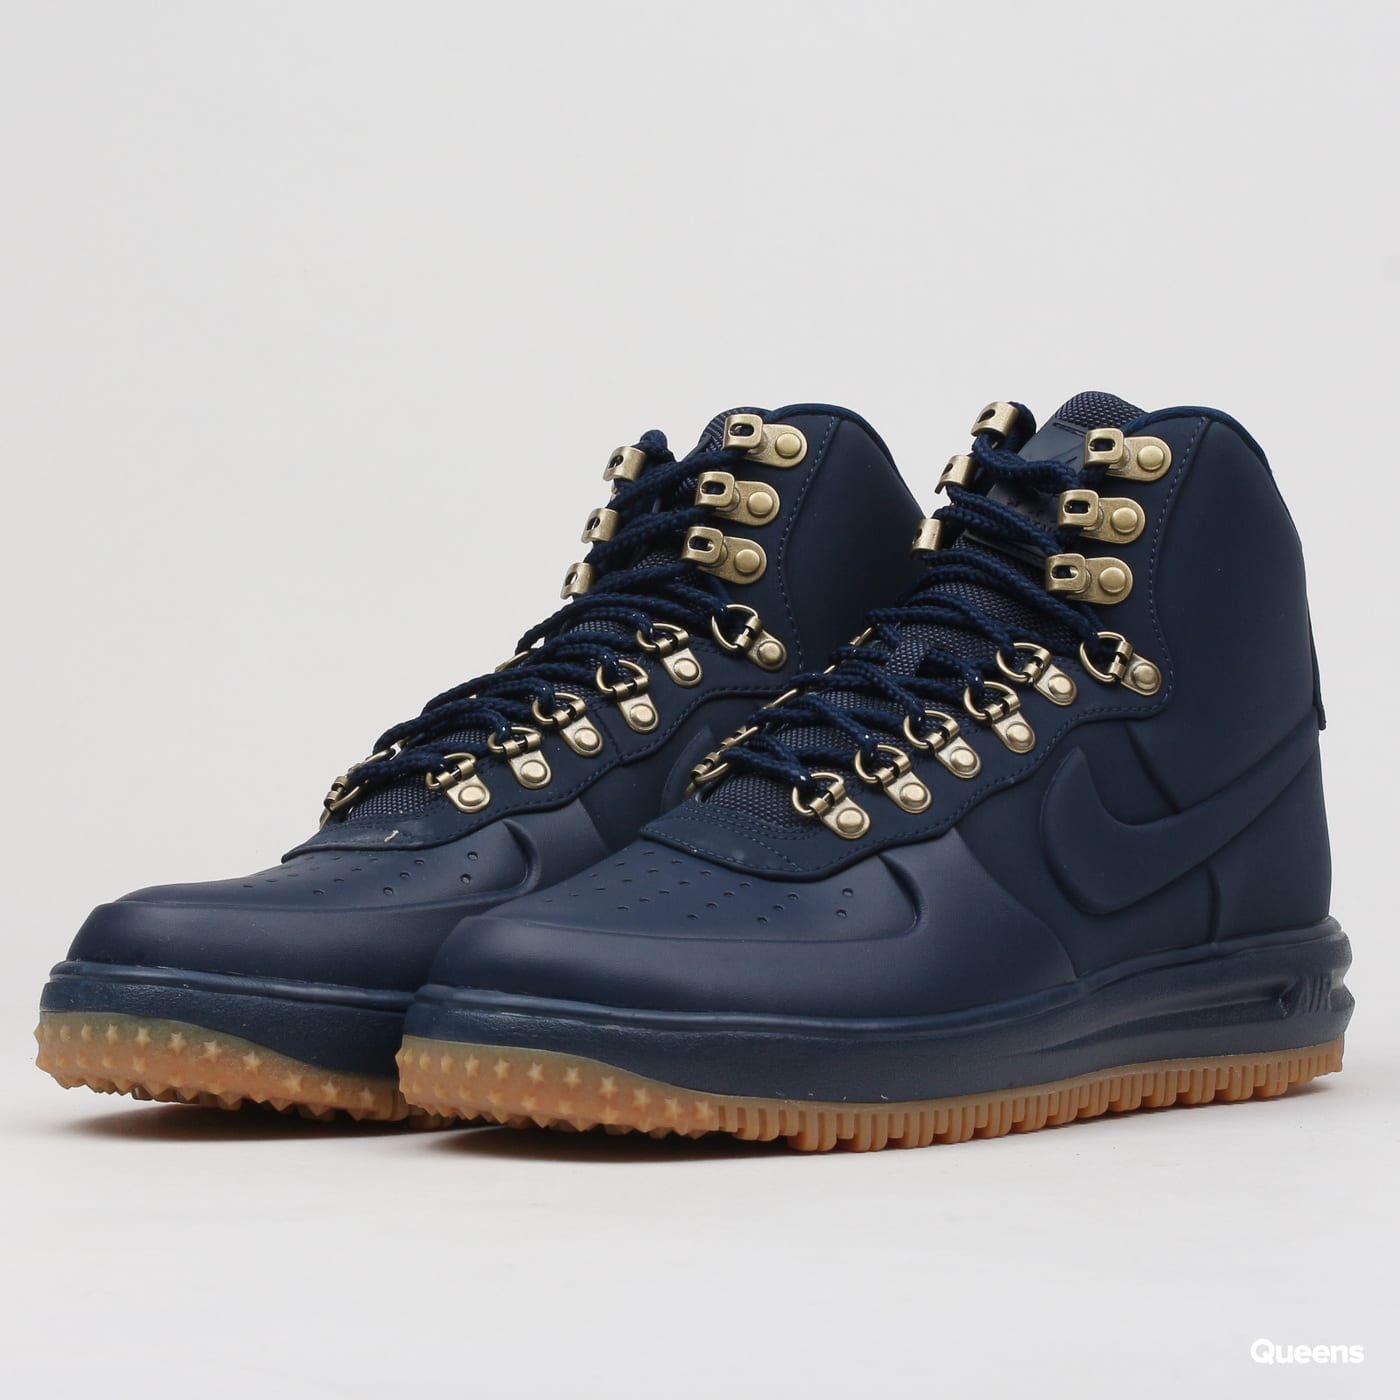 Pánské zimní boty Nike Lunar Force 1 Duckboot  18 (BQ7930-400) – Queens 💚 384b4ae14a8